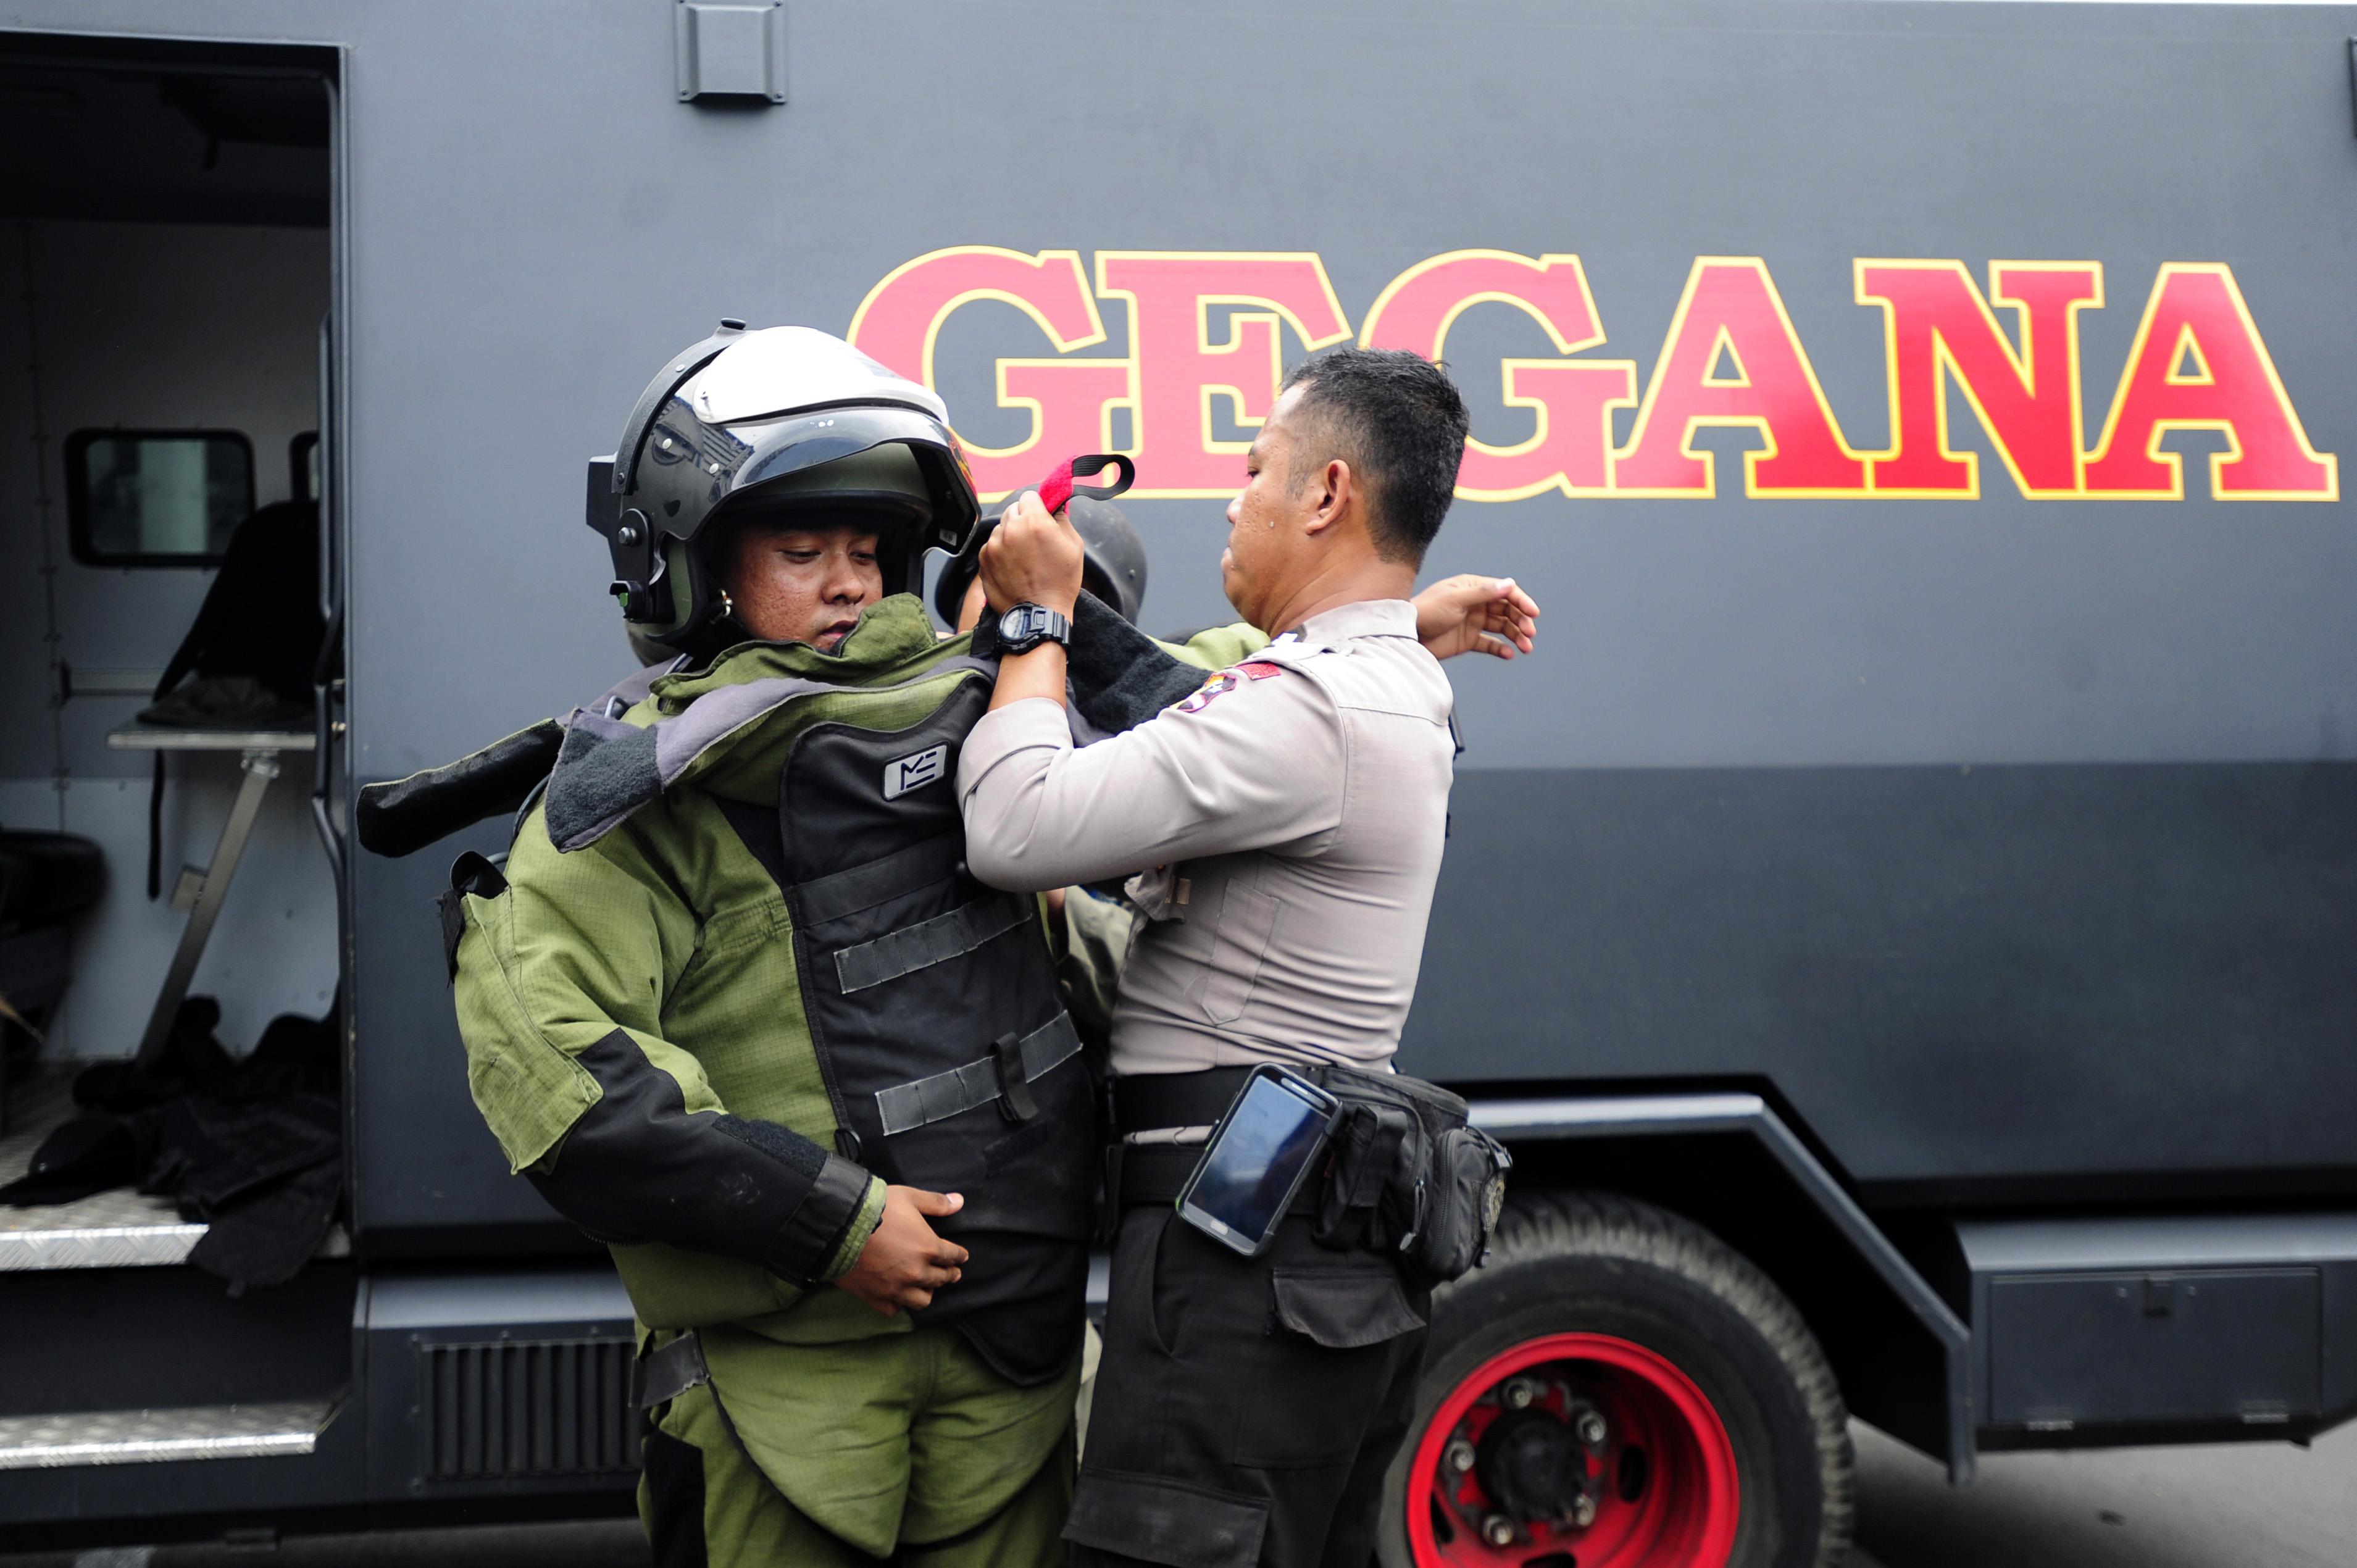 TIM GEGANA. Petugas Gegana Polda Metro Jaya bersiap untuk mengamankan plastik yang mencurigakan di lokasi ledakan Pos Polisi Sarinah, Jakarta, pada 14 Januari 2016. Foto oleh Wahyu Putro A/Antara